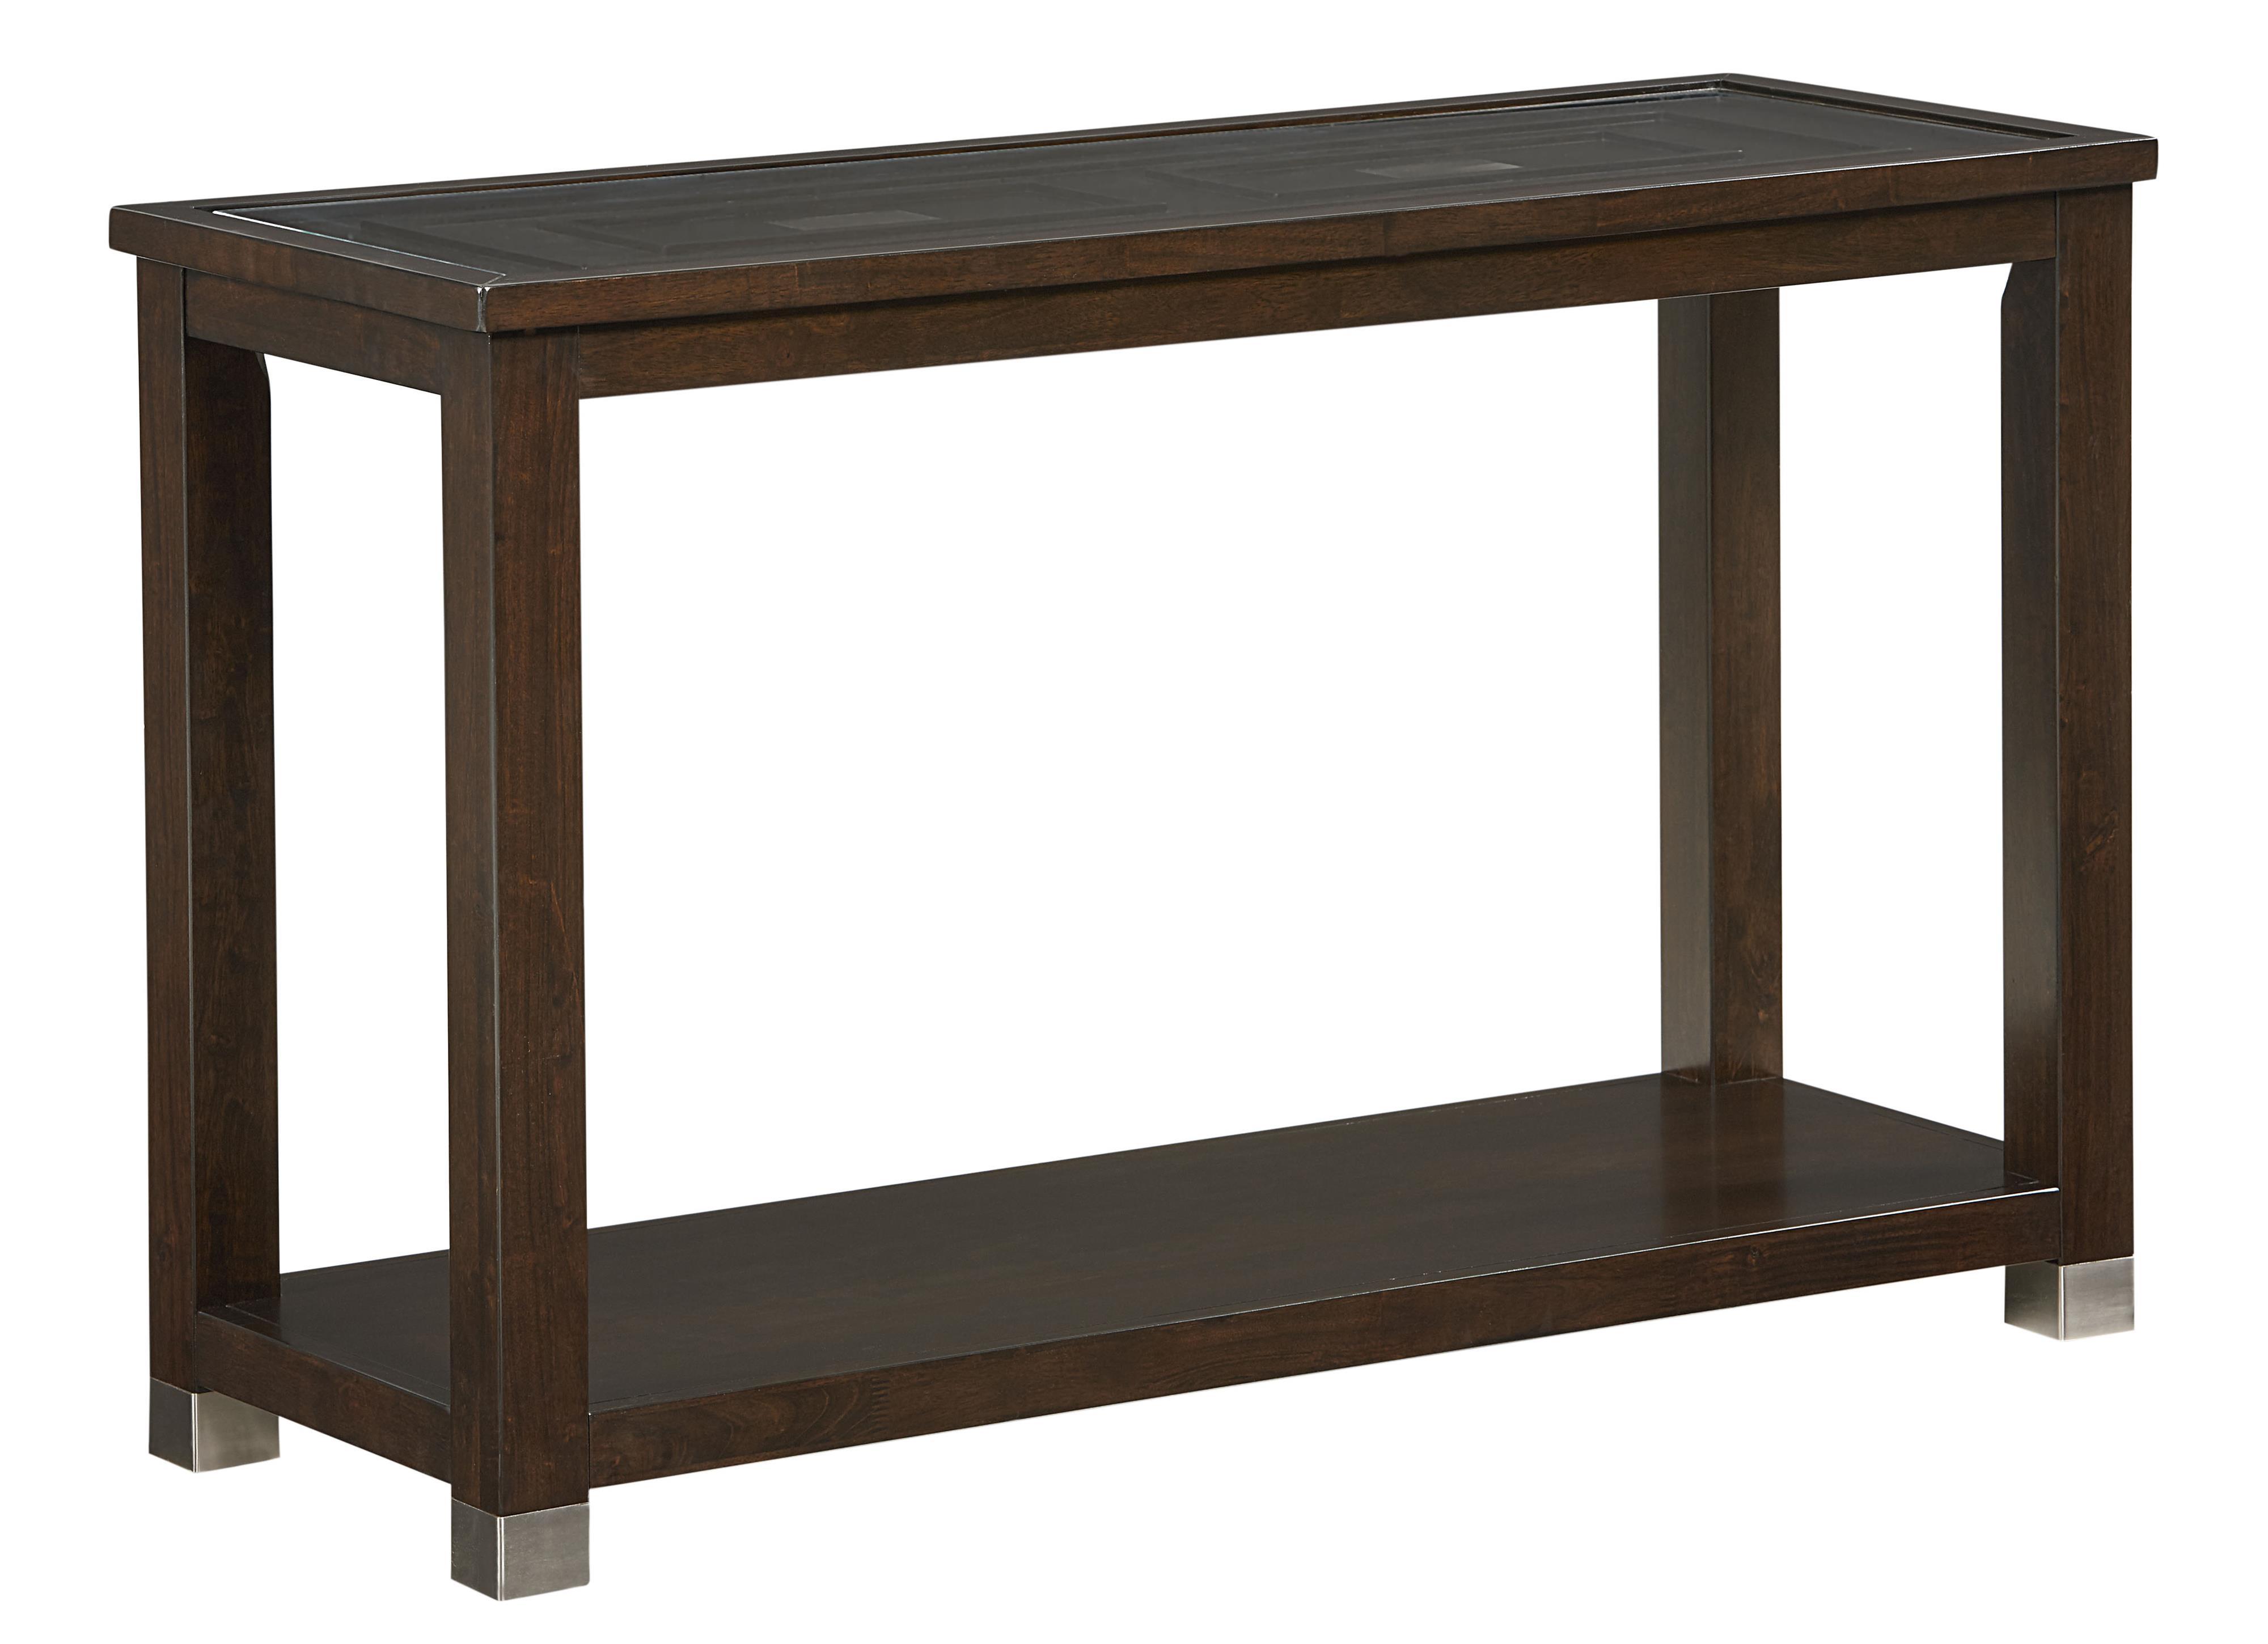 Standard Furniture Colton Sofa Table                             - Item Number: 29077